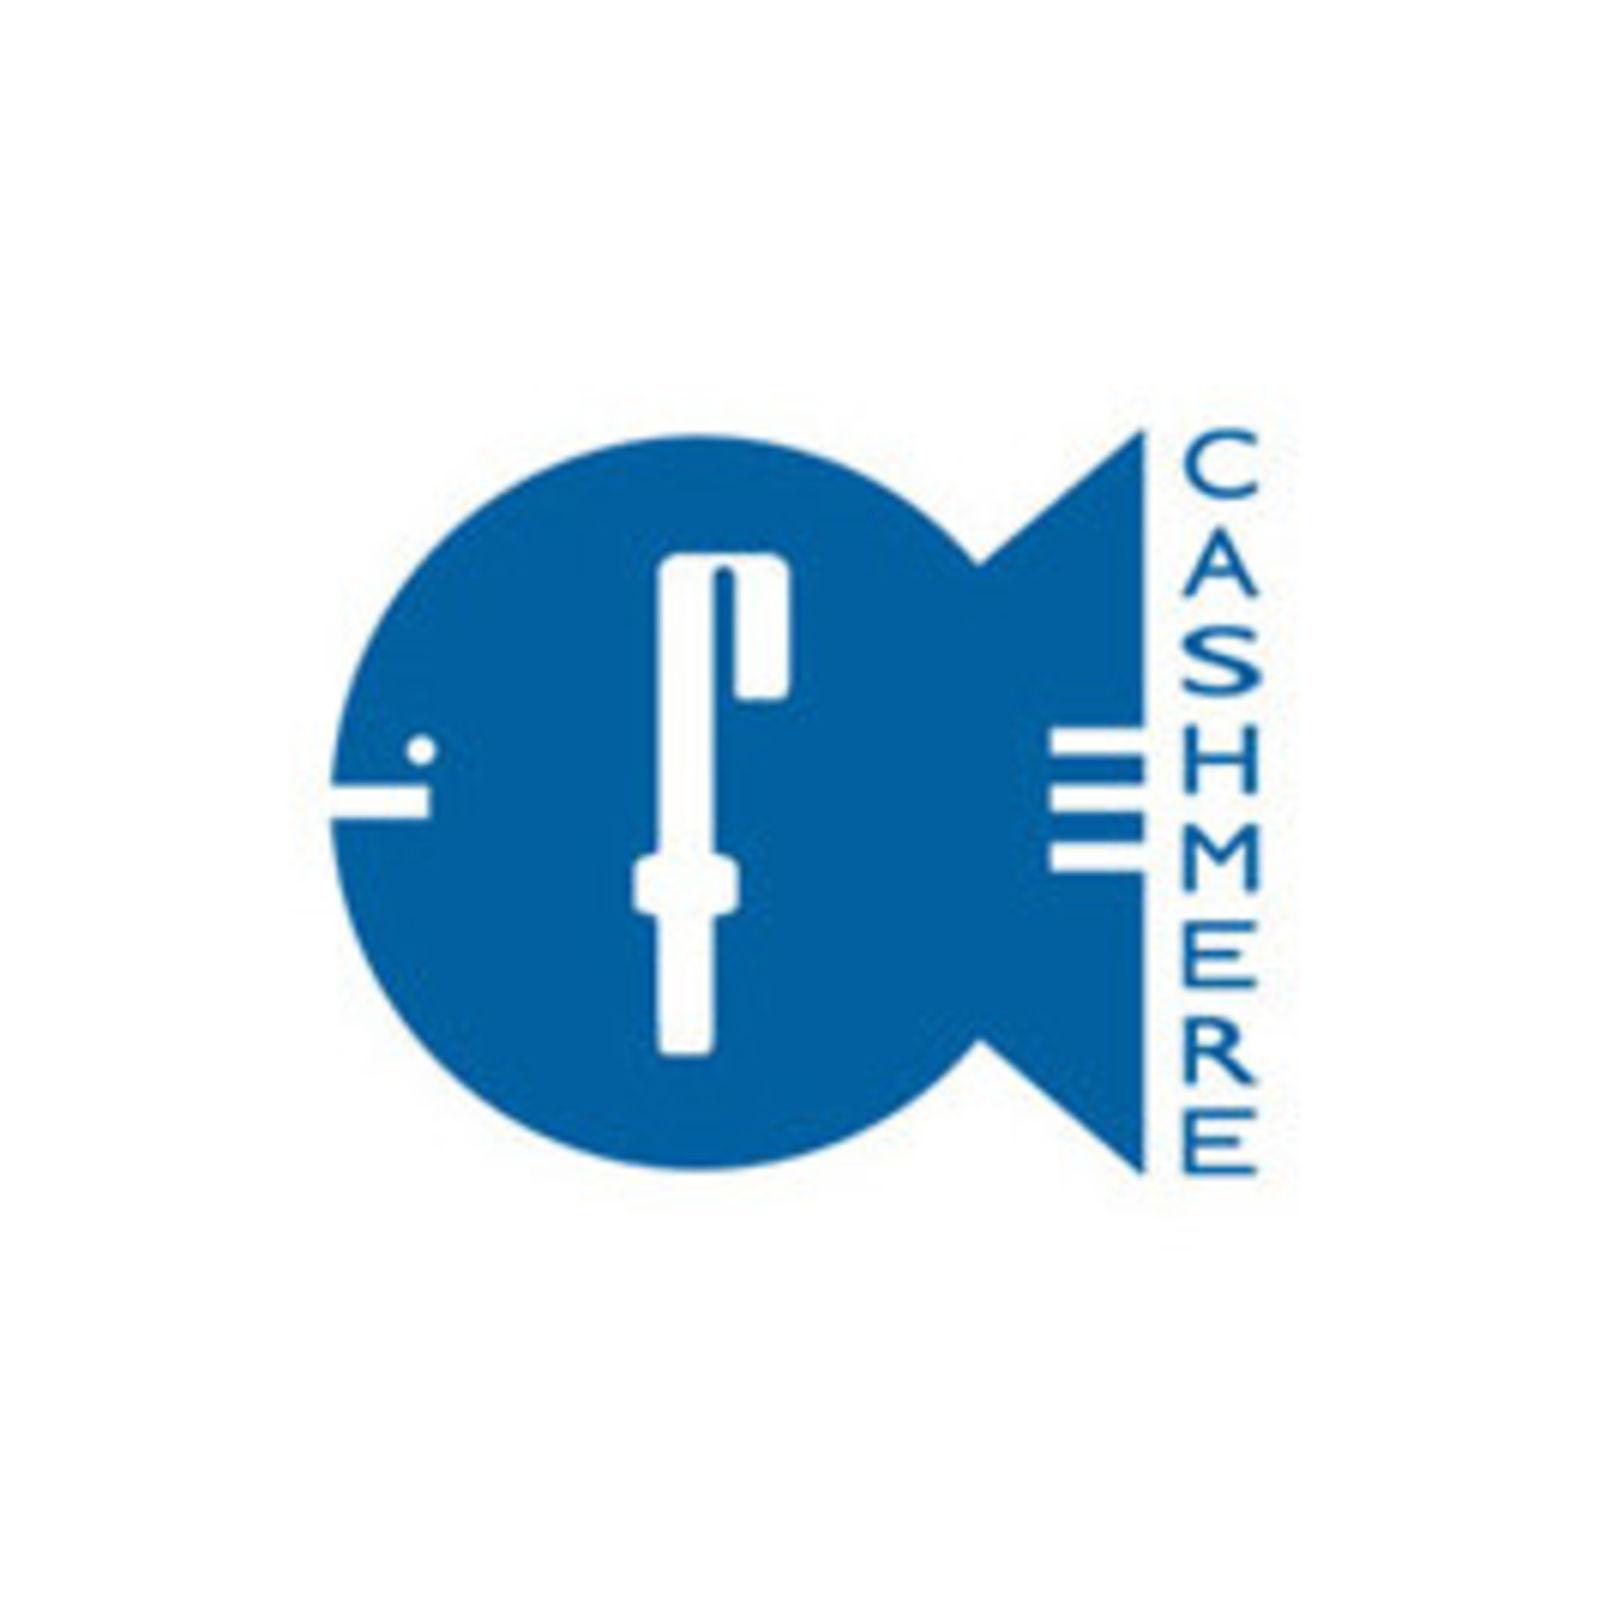 f cashmere